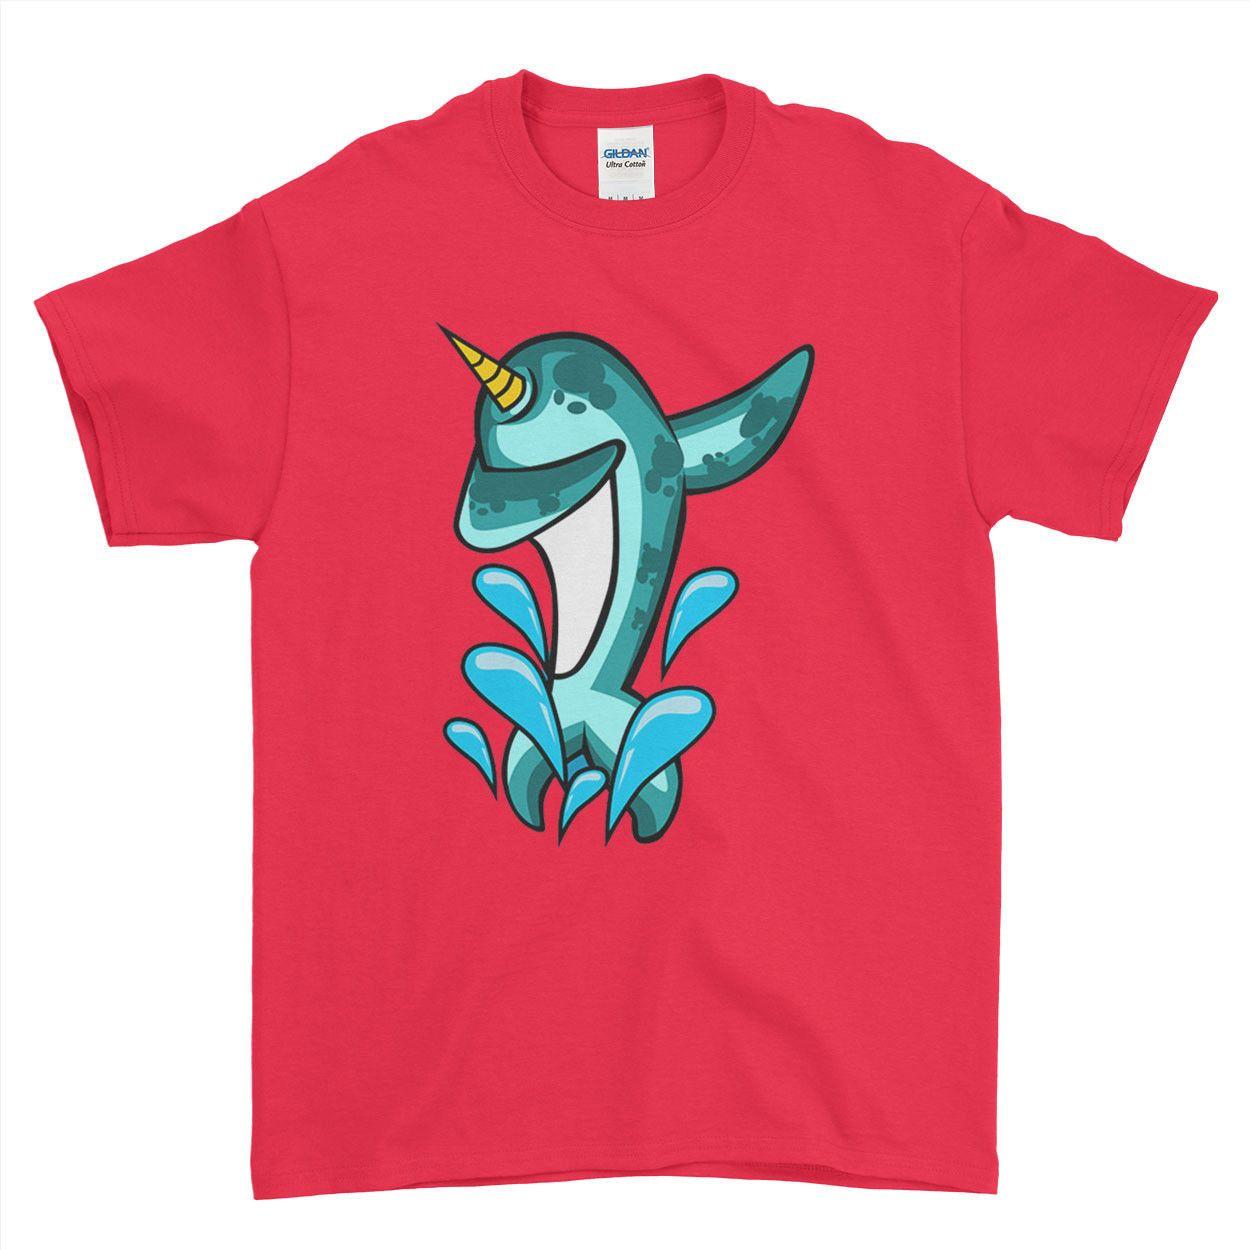 939ae9e6 Cute Unicorn Narwhal Funny Cartoon Mens Womens Kids T Shirt O Neck Fashion  Printed Mens Cotton T Shirt Round Neck Man'S T Shirt Shopping Awesome Tee  Shirts ...